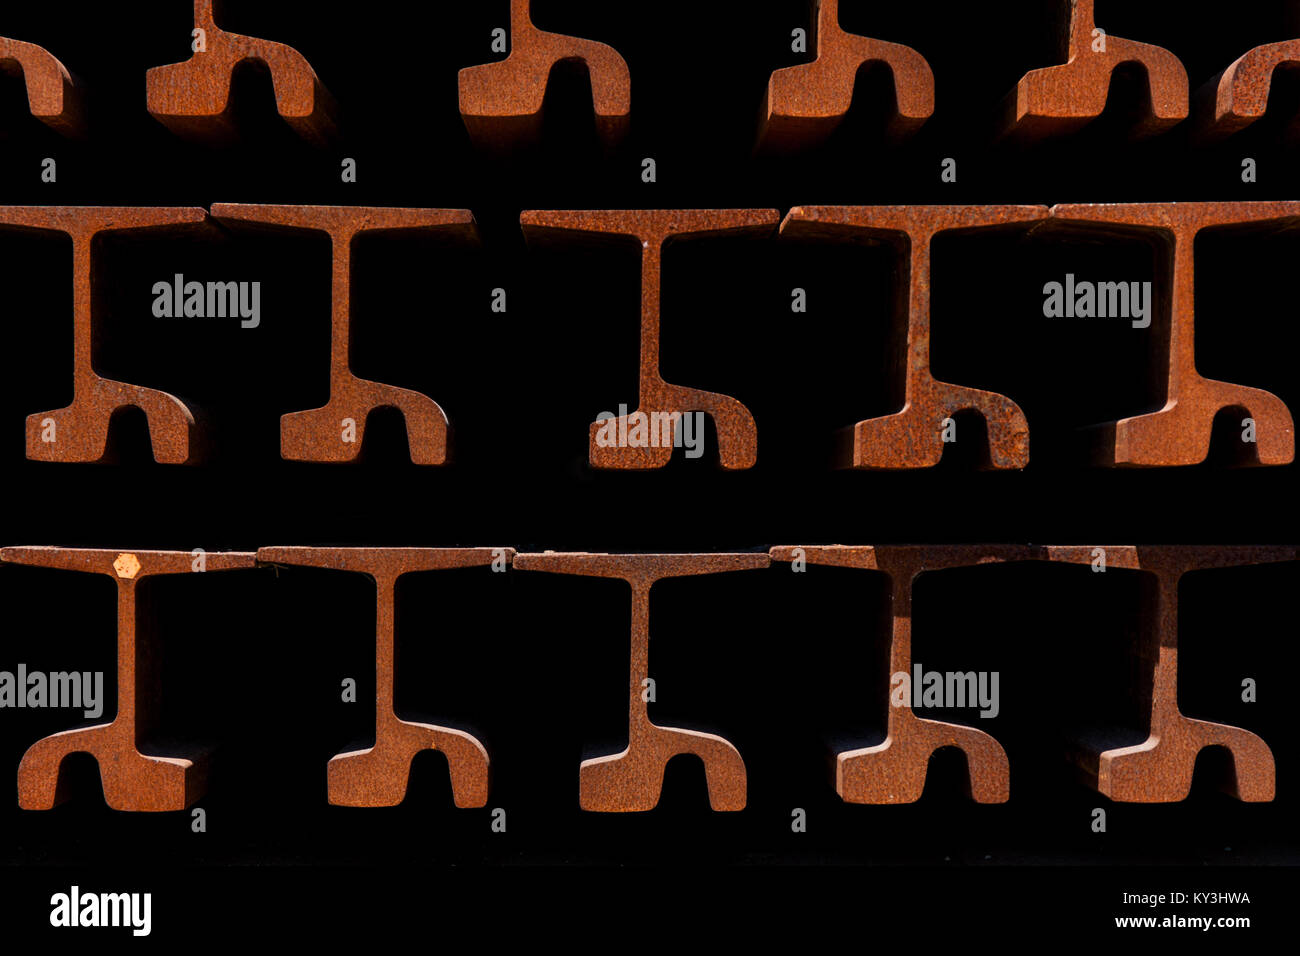 Pile of rusty train tracks - Stock Image